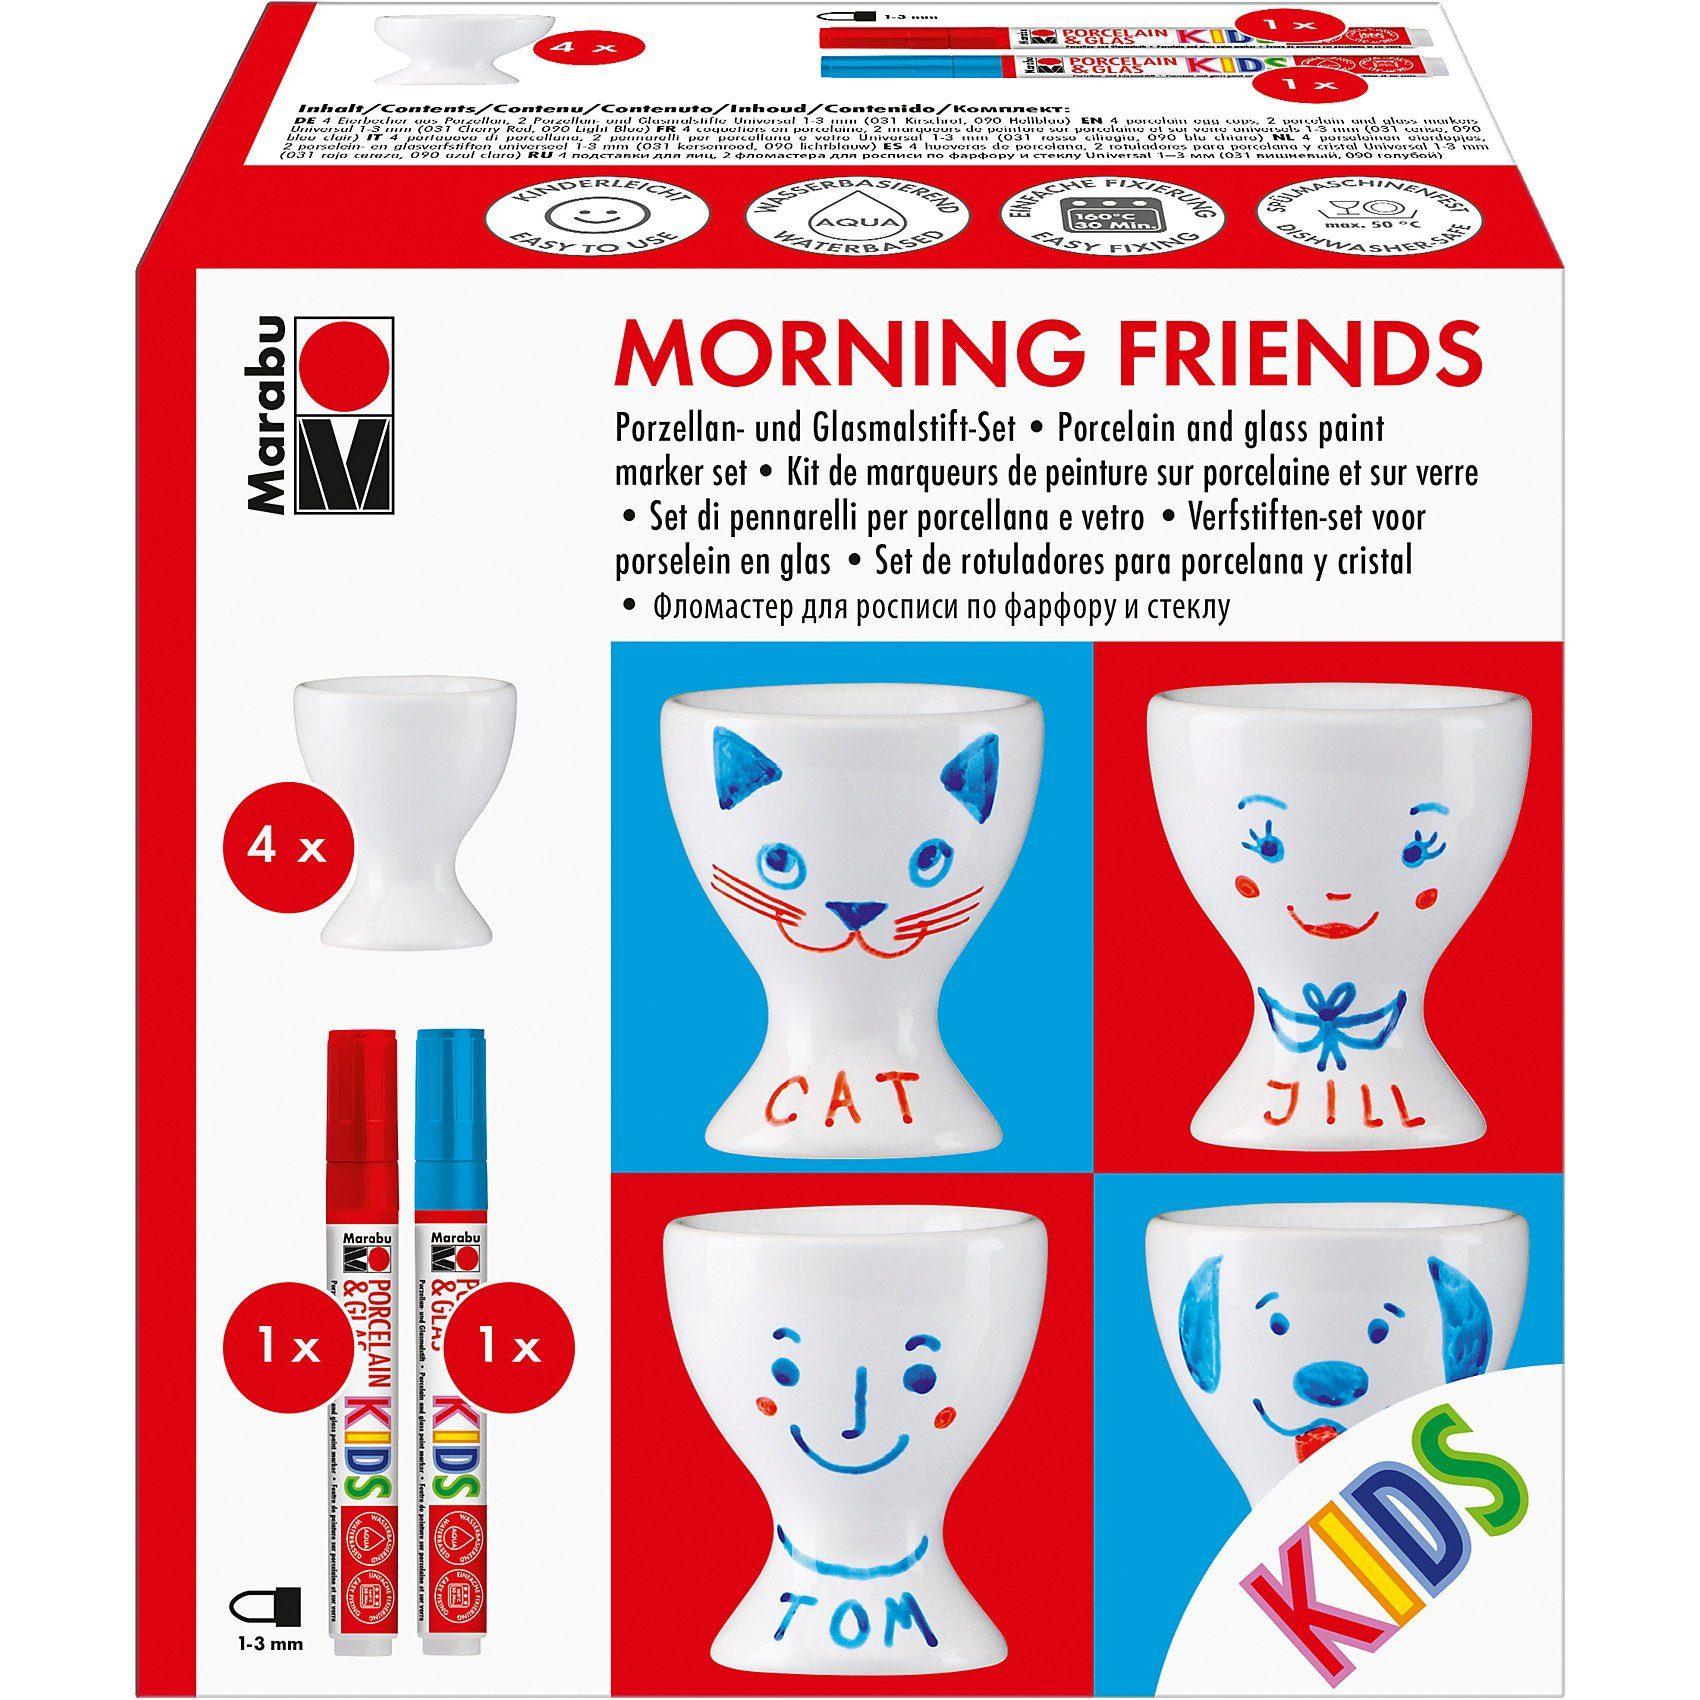 Marabu KIDS Porzellan- & Glasfarben-Set Morning friends, 4 Eierbech